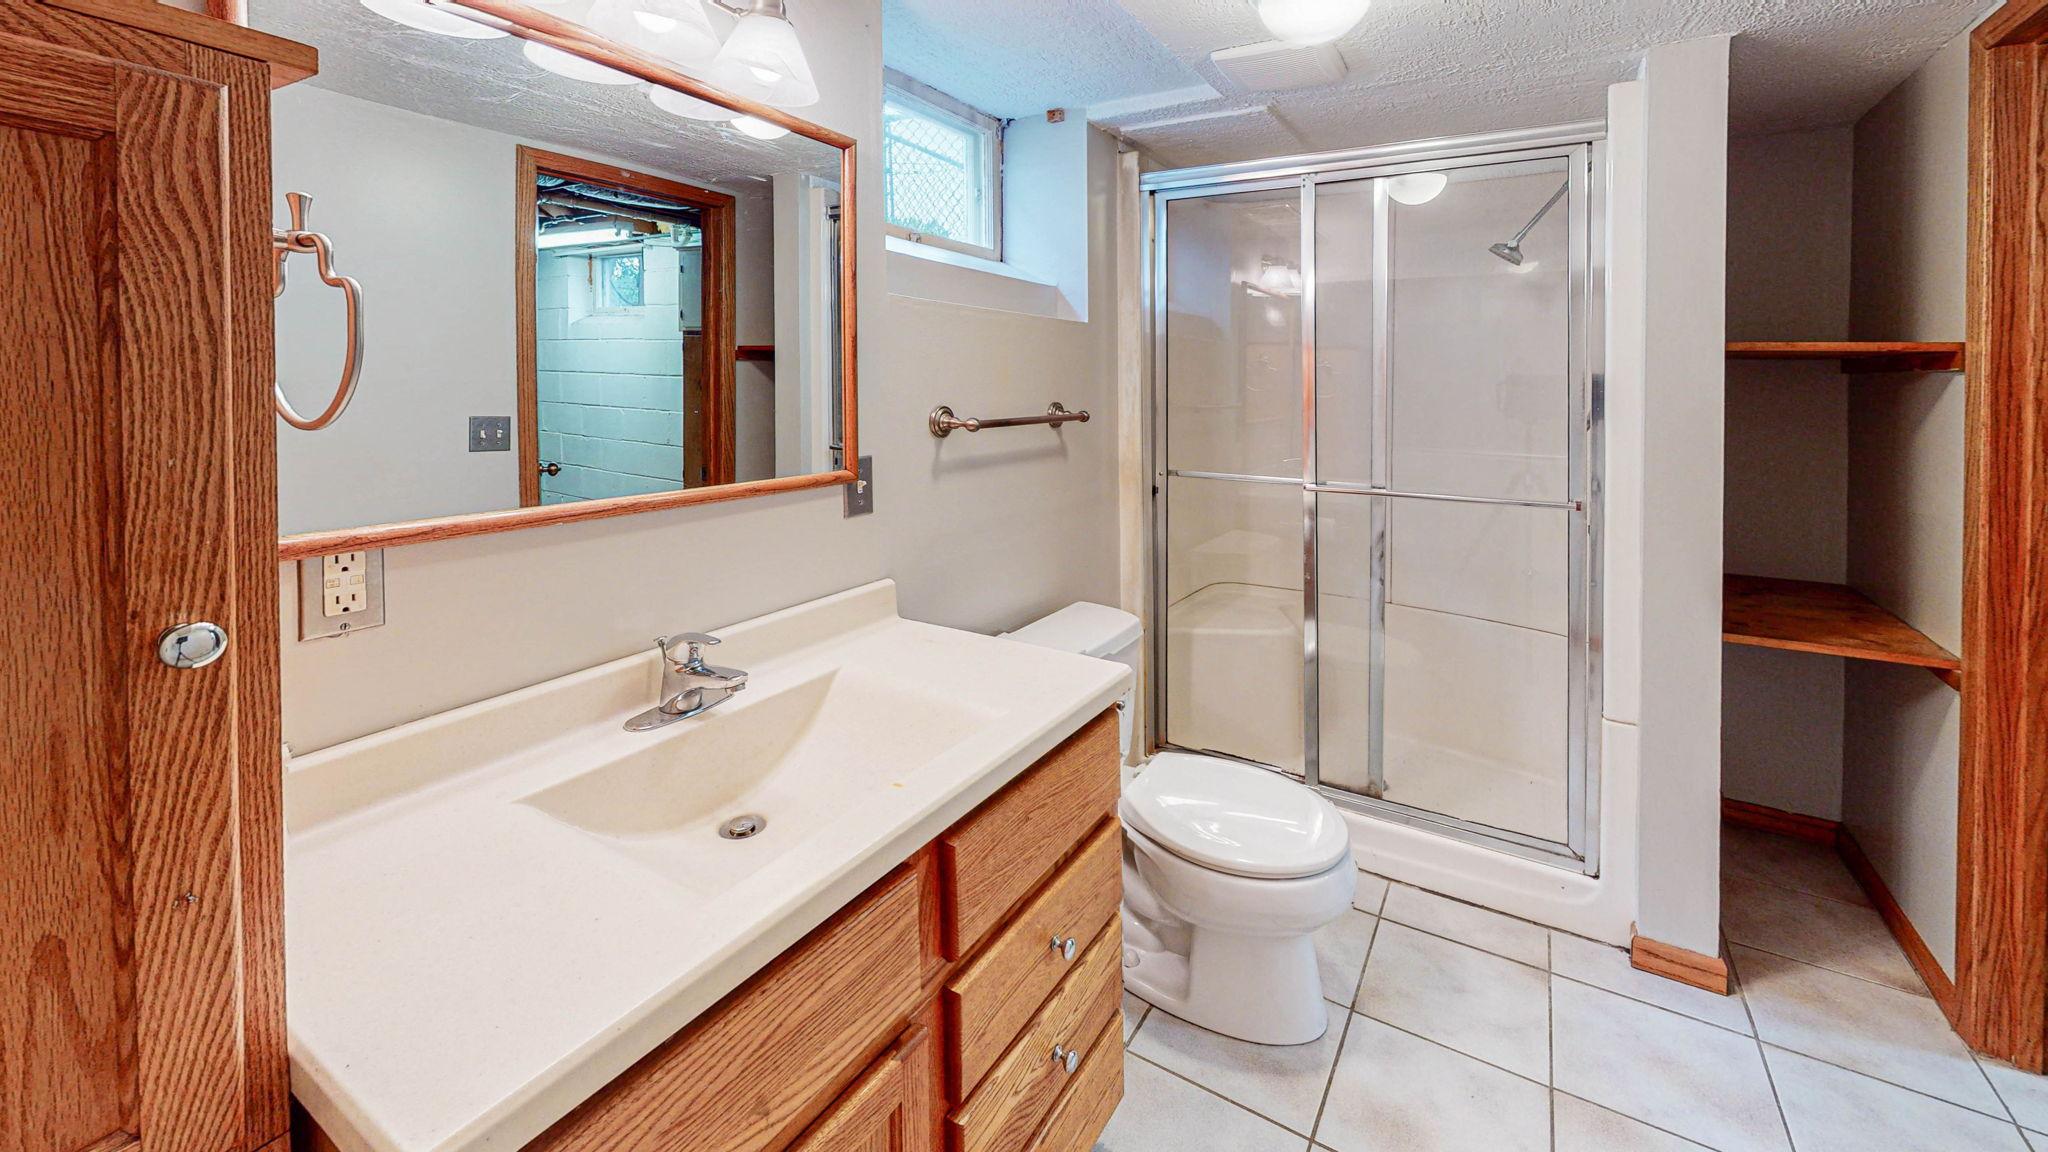 6141 Sheridan Ave S, Minneapolis, MN 55410, USA Photo 15